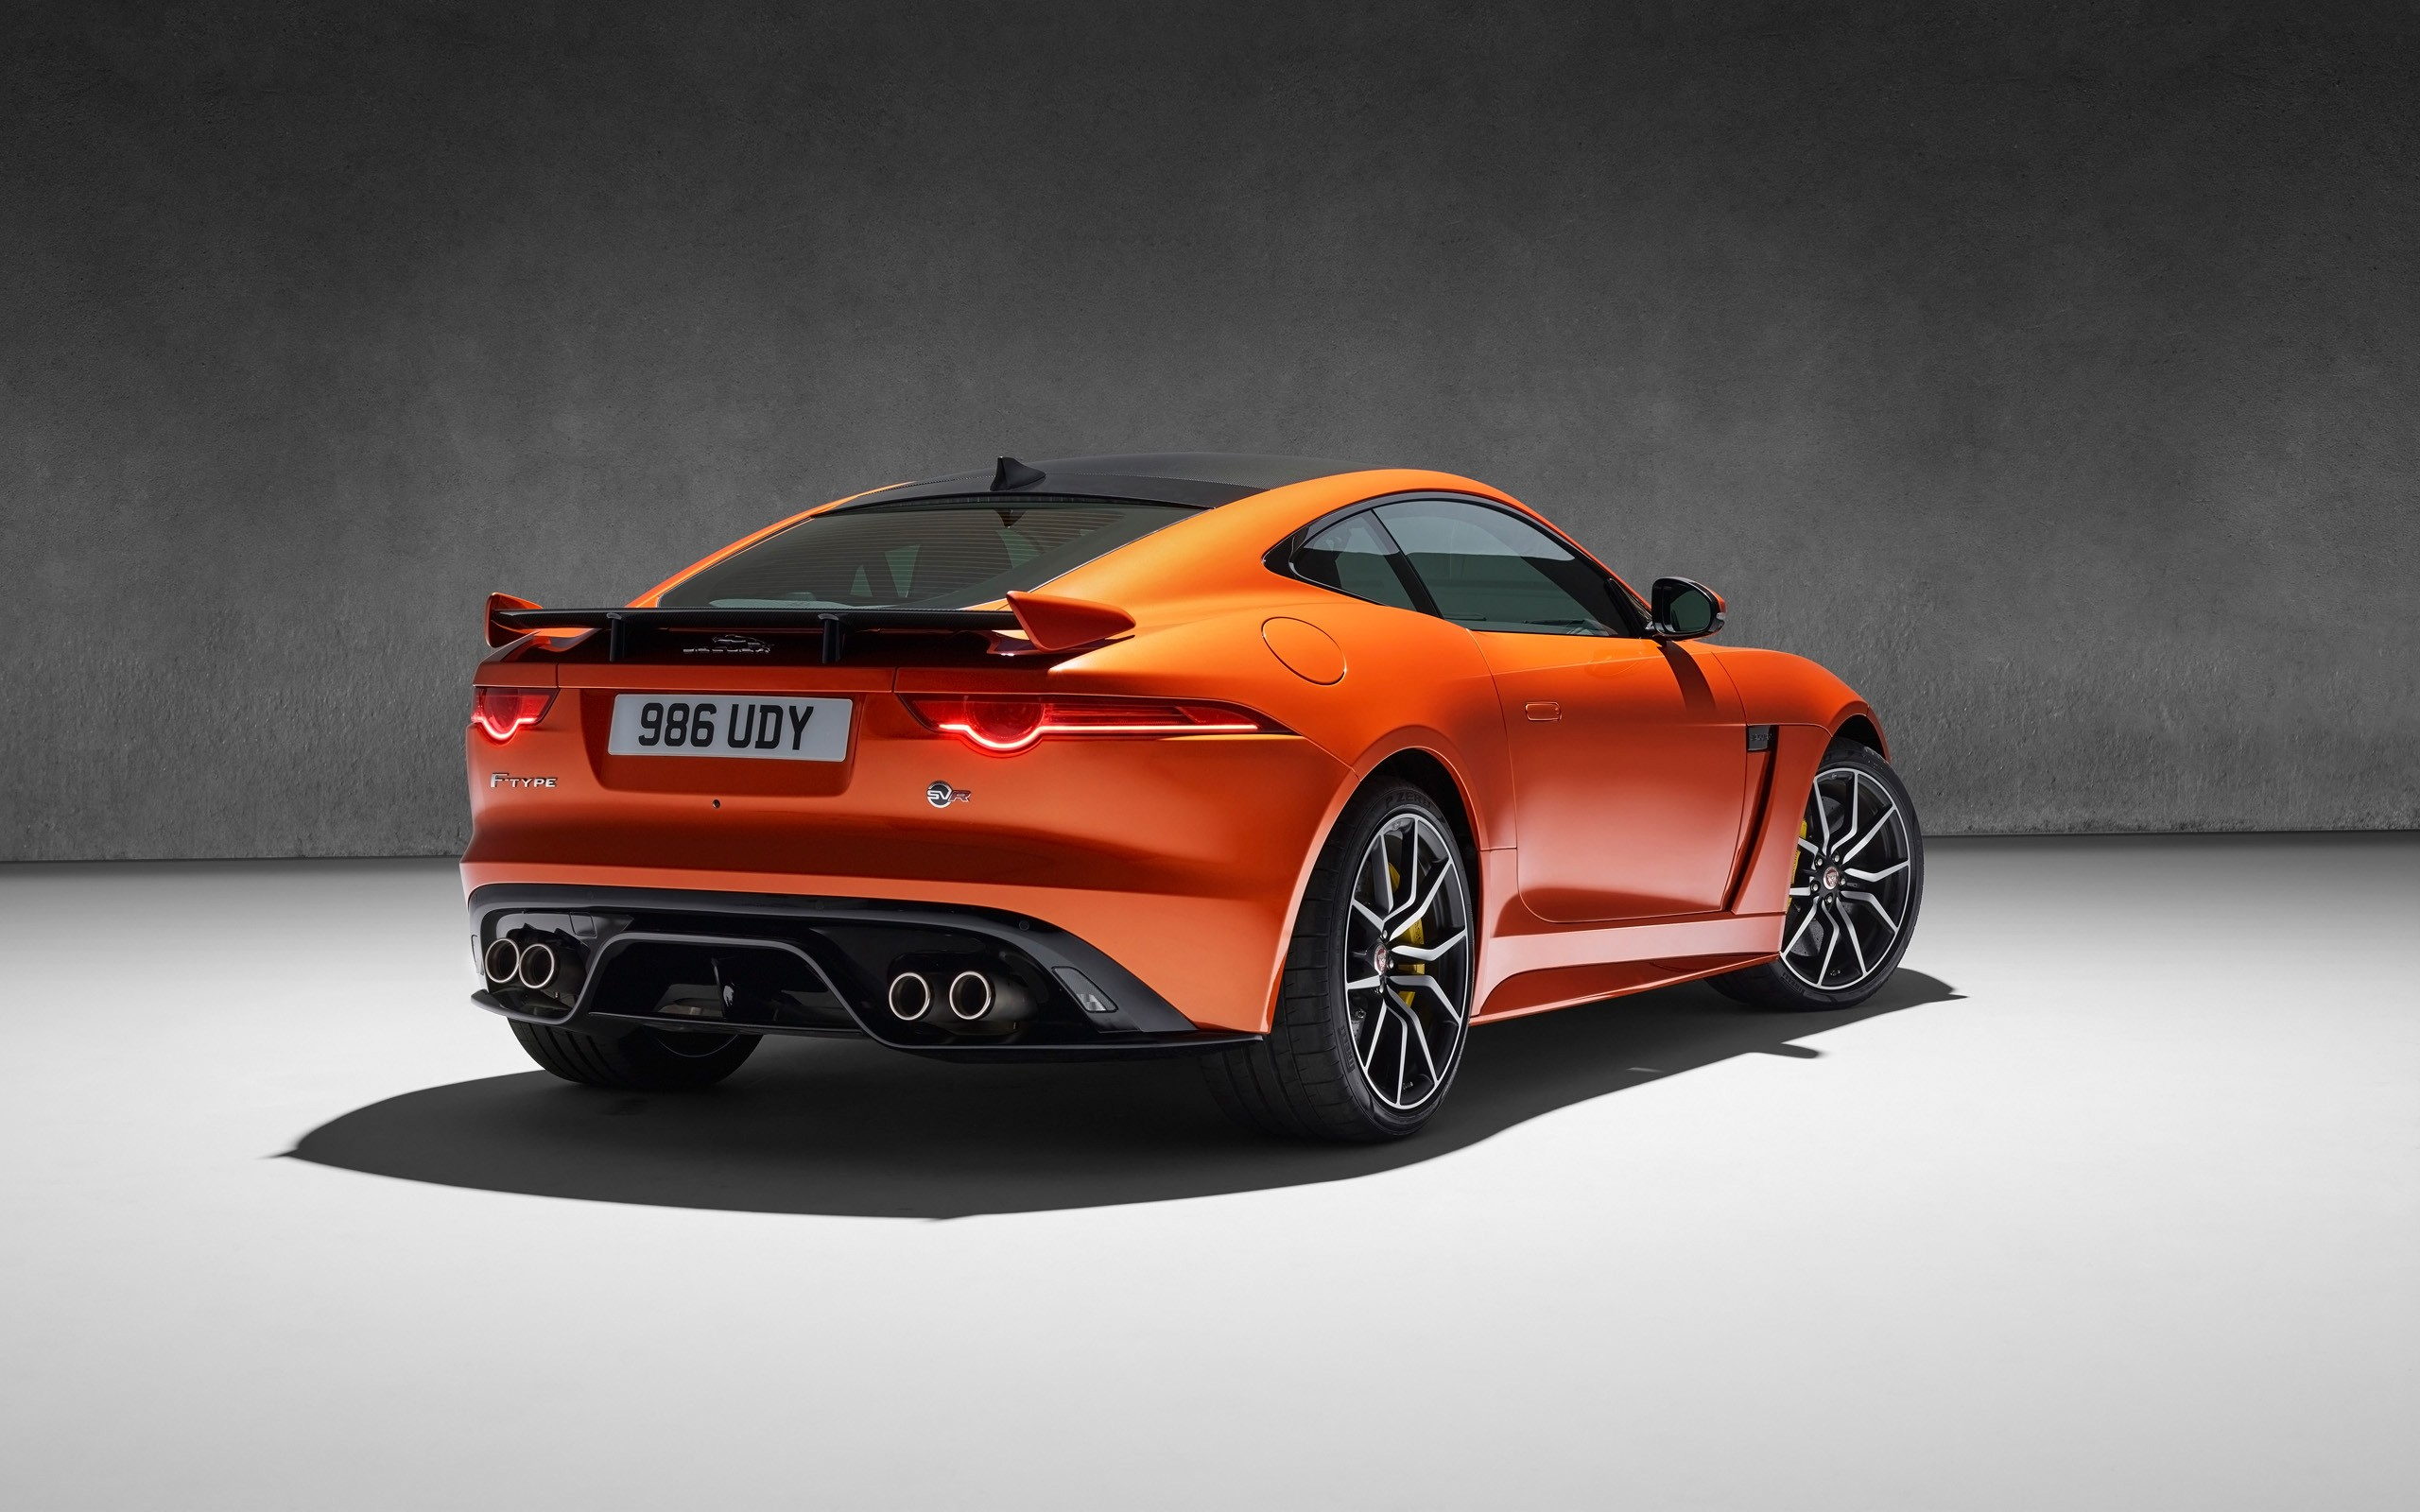 2017 jaguar f type svr coupe rear wallpaper hd car